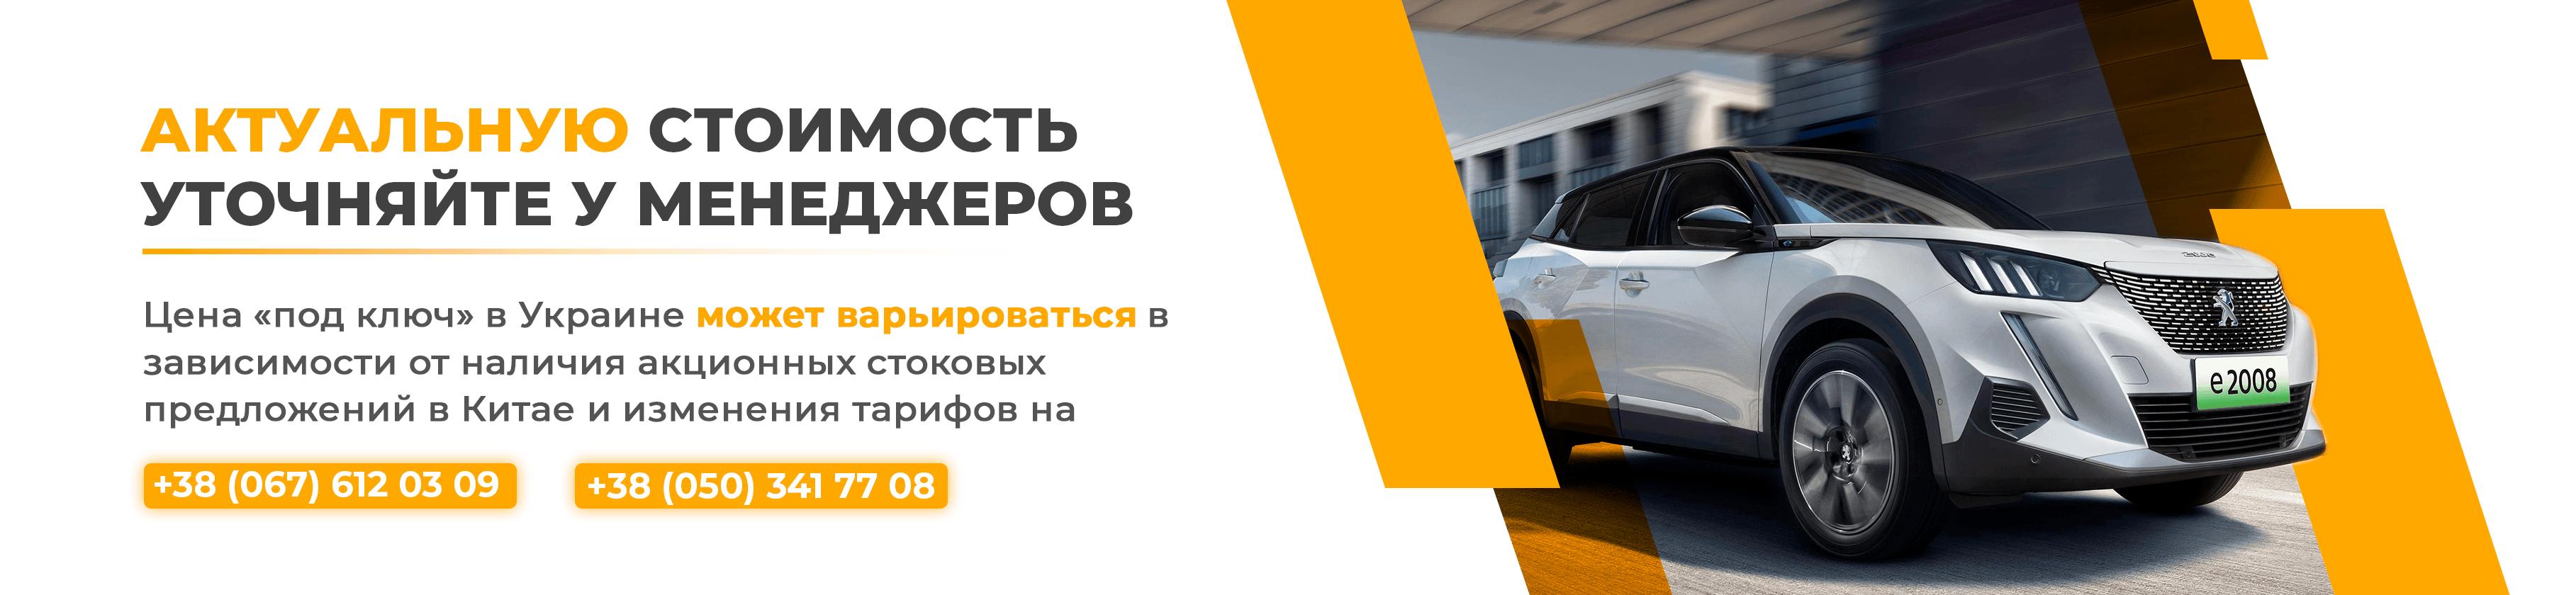 цена BAIC EC 3 под ключ в Украине